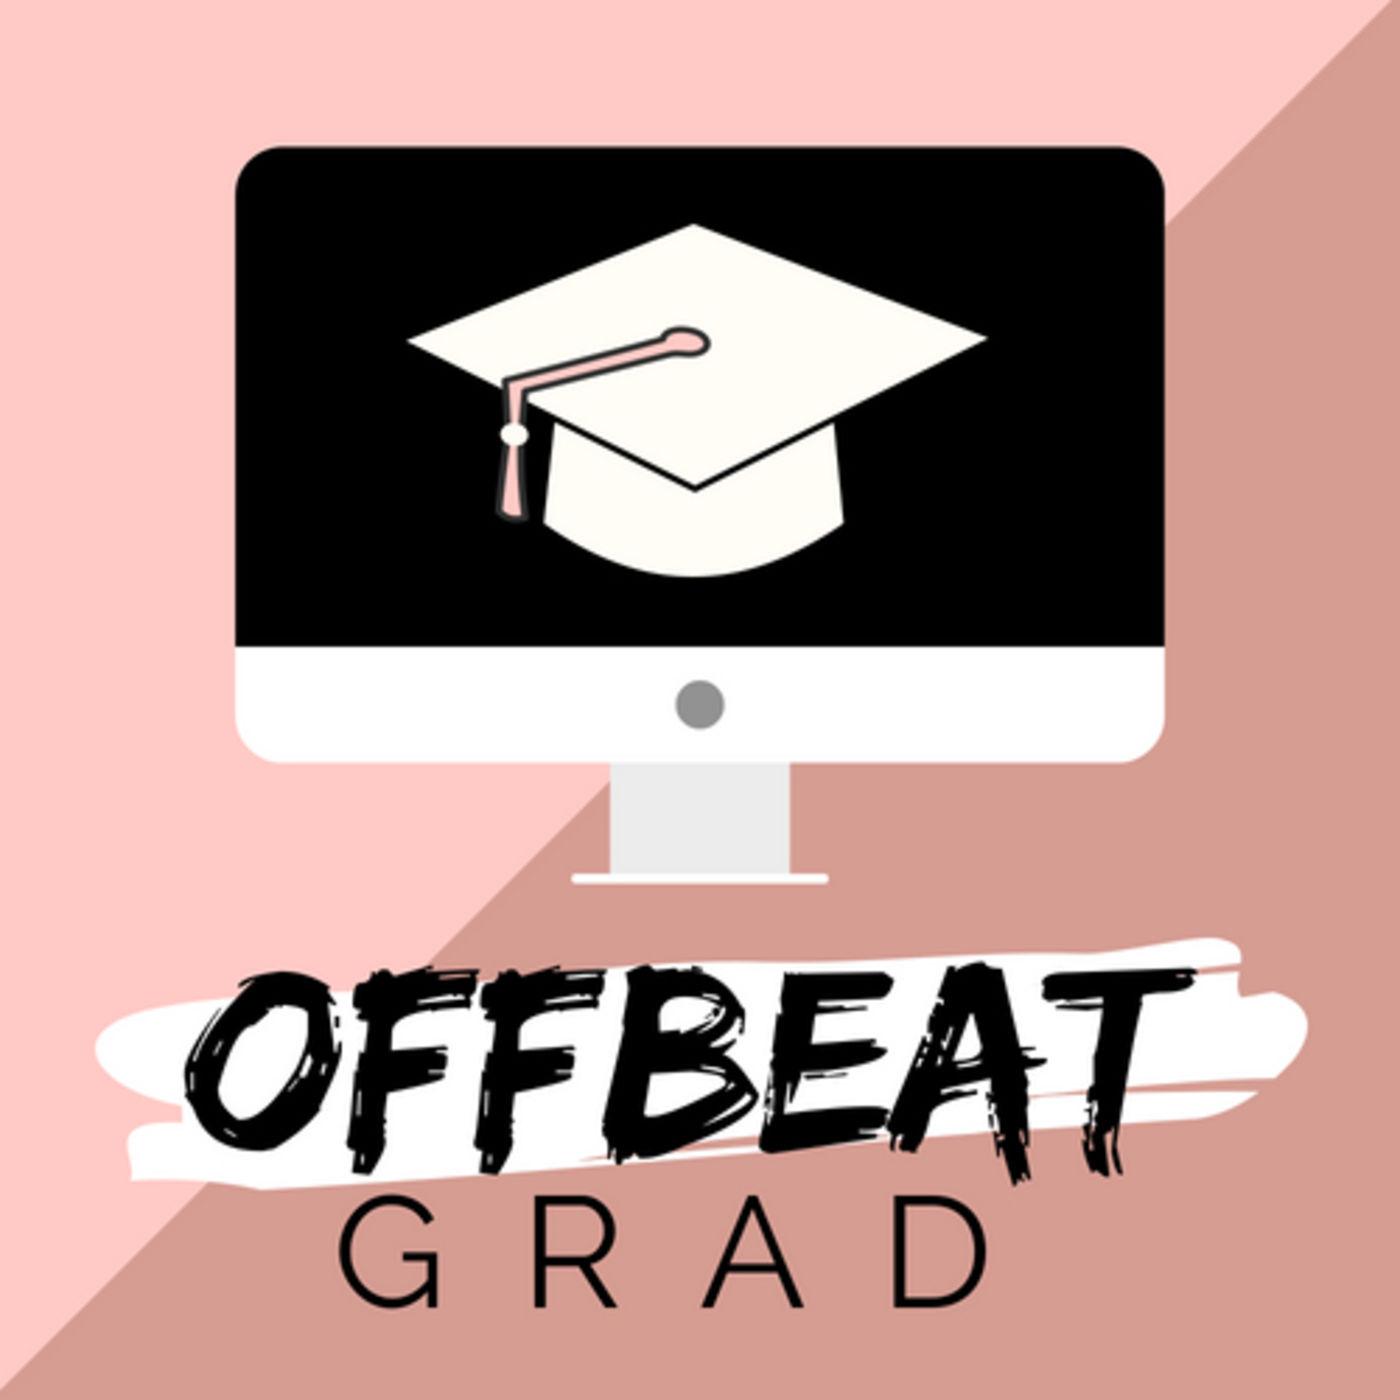 Offbeat Grad